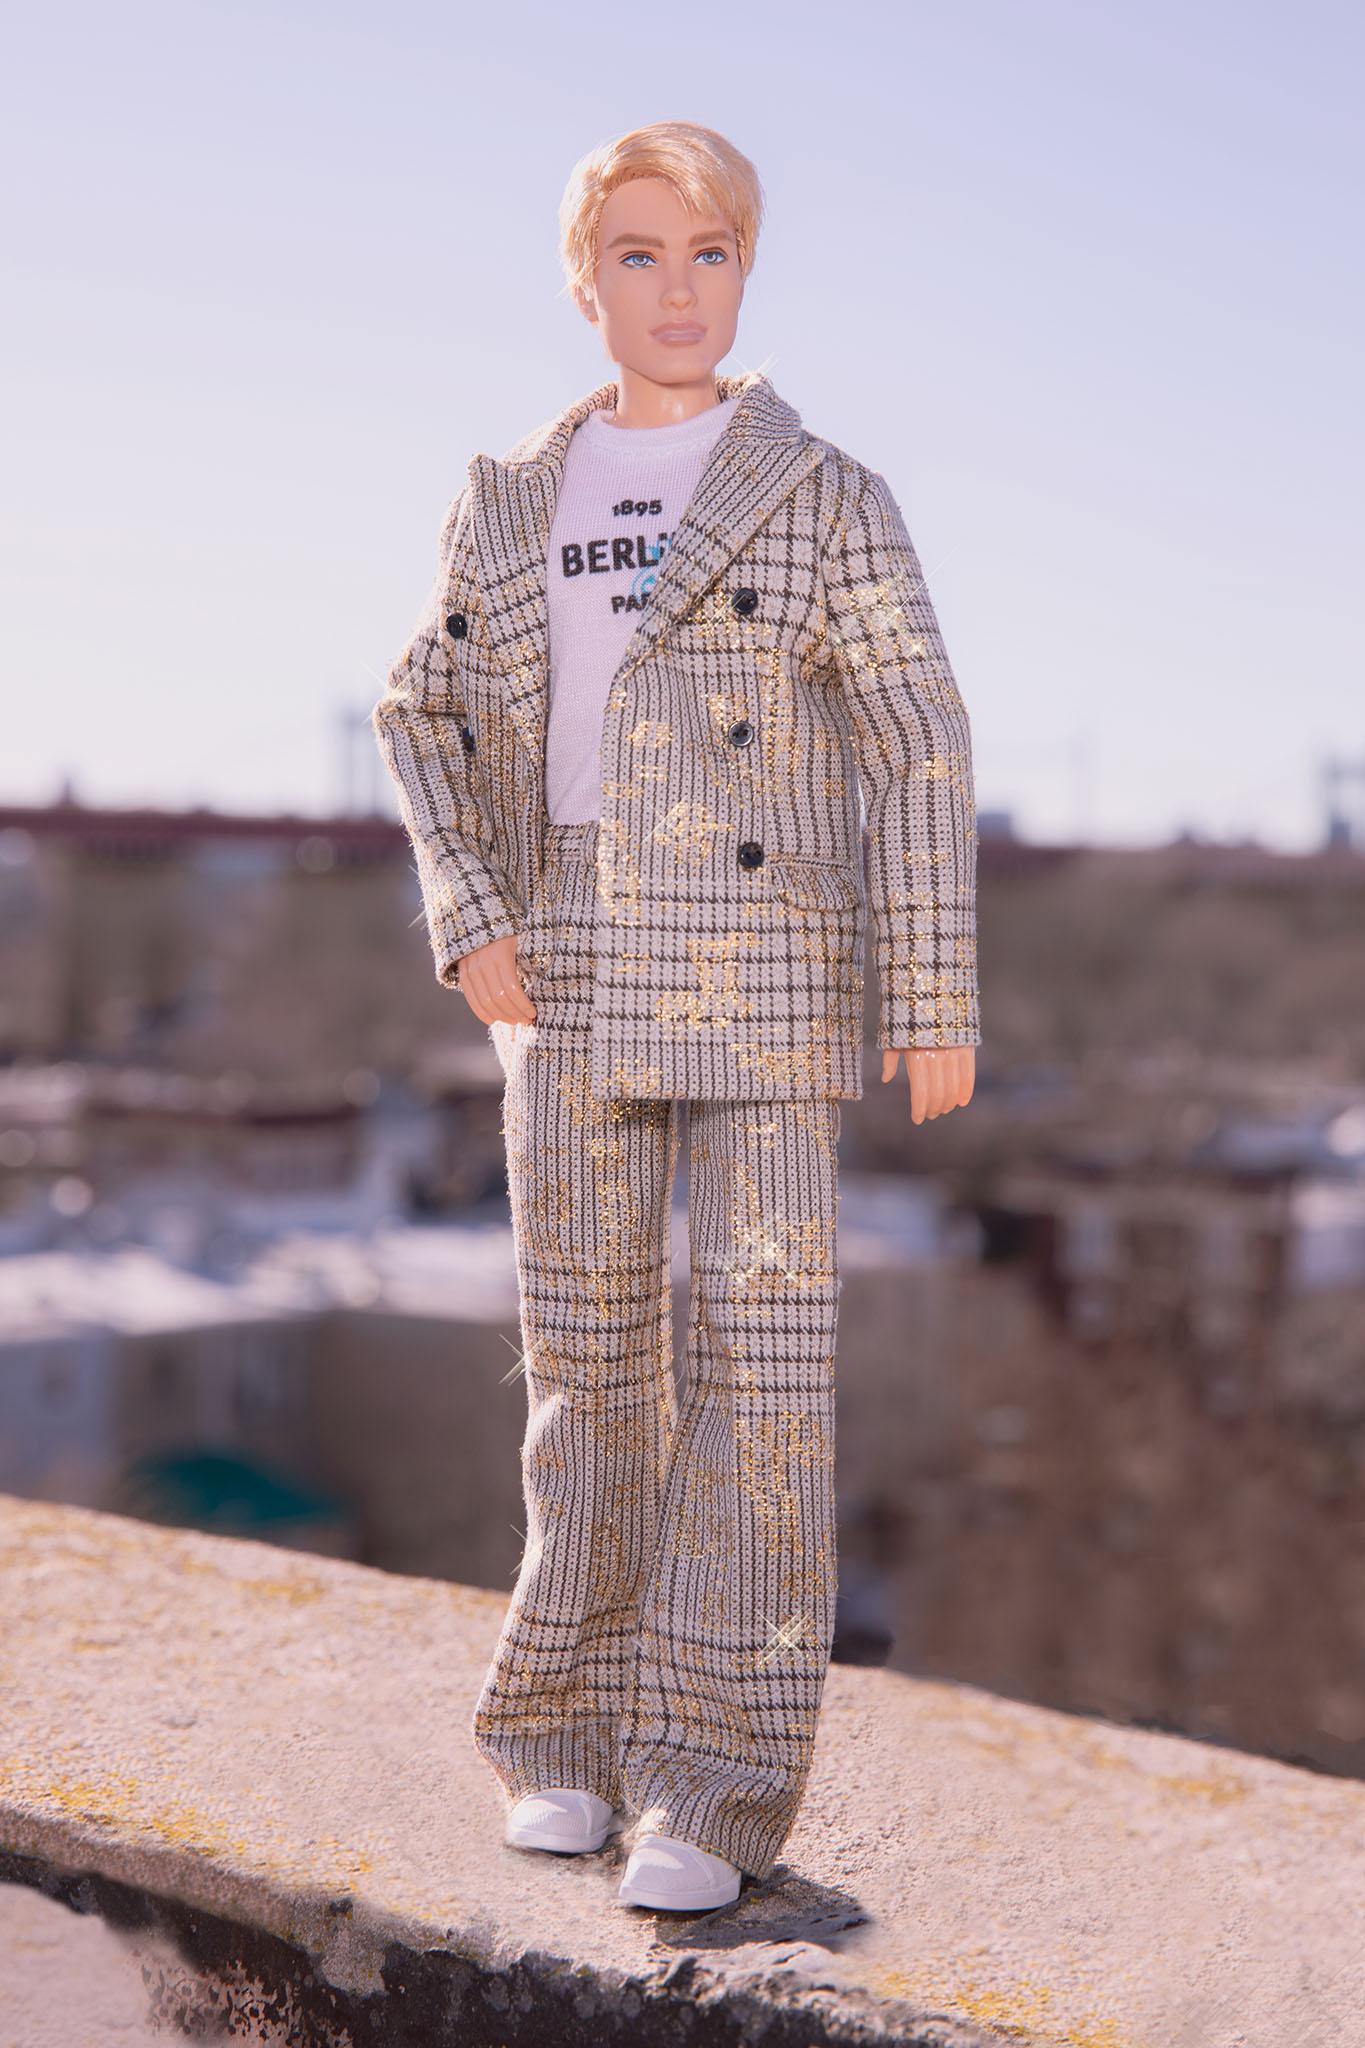 Mattel collaborated with Kris Van Assche, Creative Director of  Berluti, to create three Ken dolls for Ken's 60th birthday.